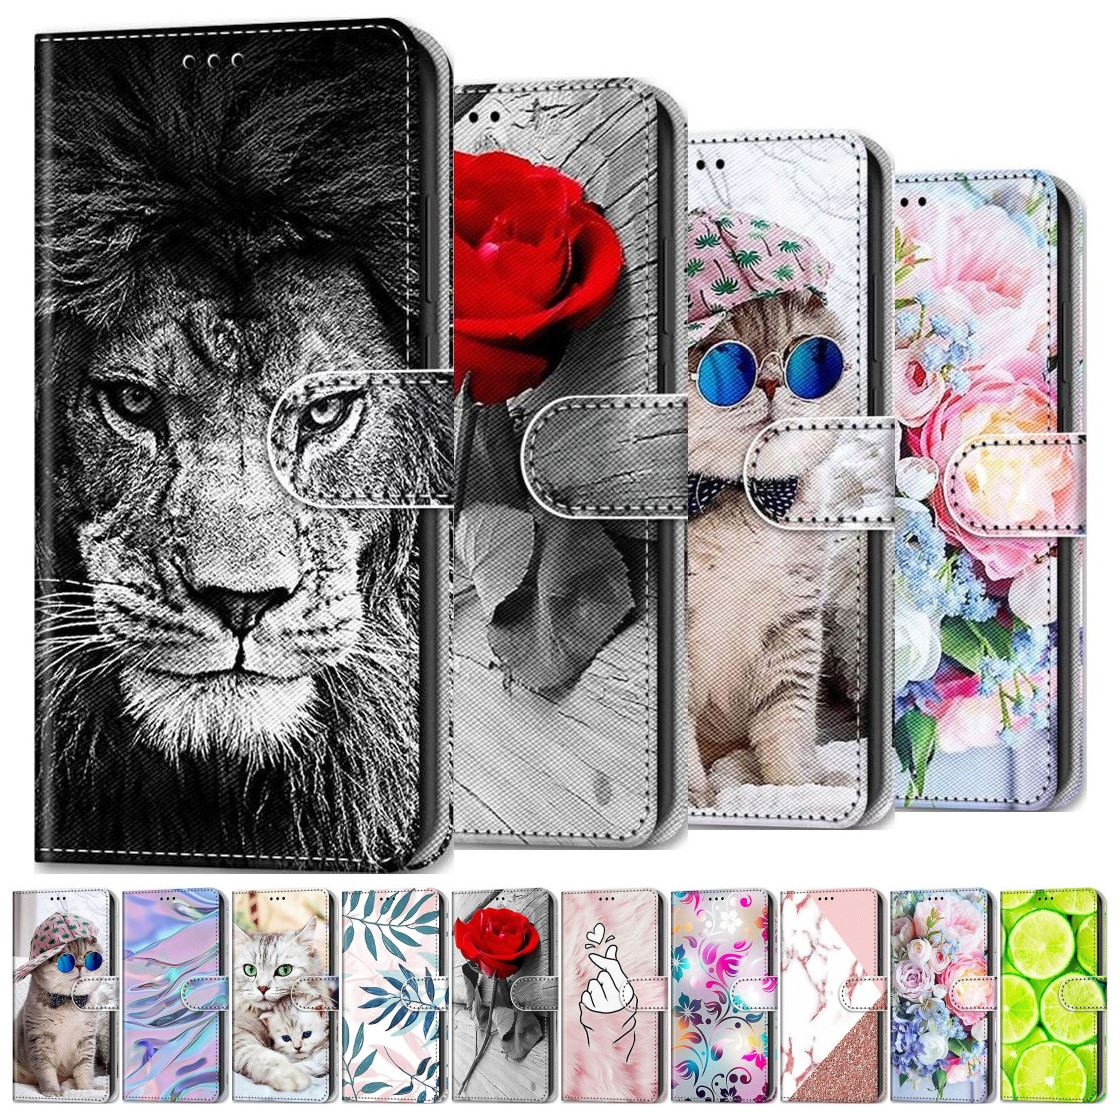 Rose Lion Painted Phone Shell For Case Huawei P Smart 2020 Z 2019 P40 Lite E P30 Pro P20 Plus 2018 P